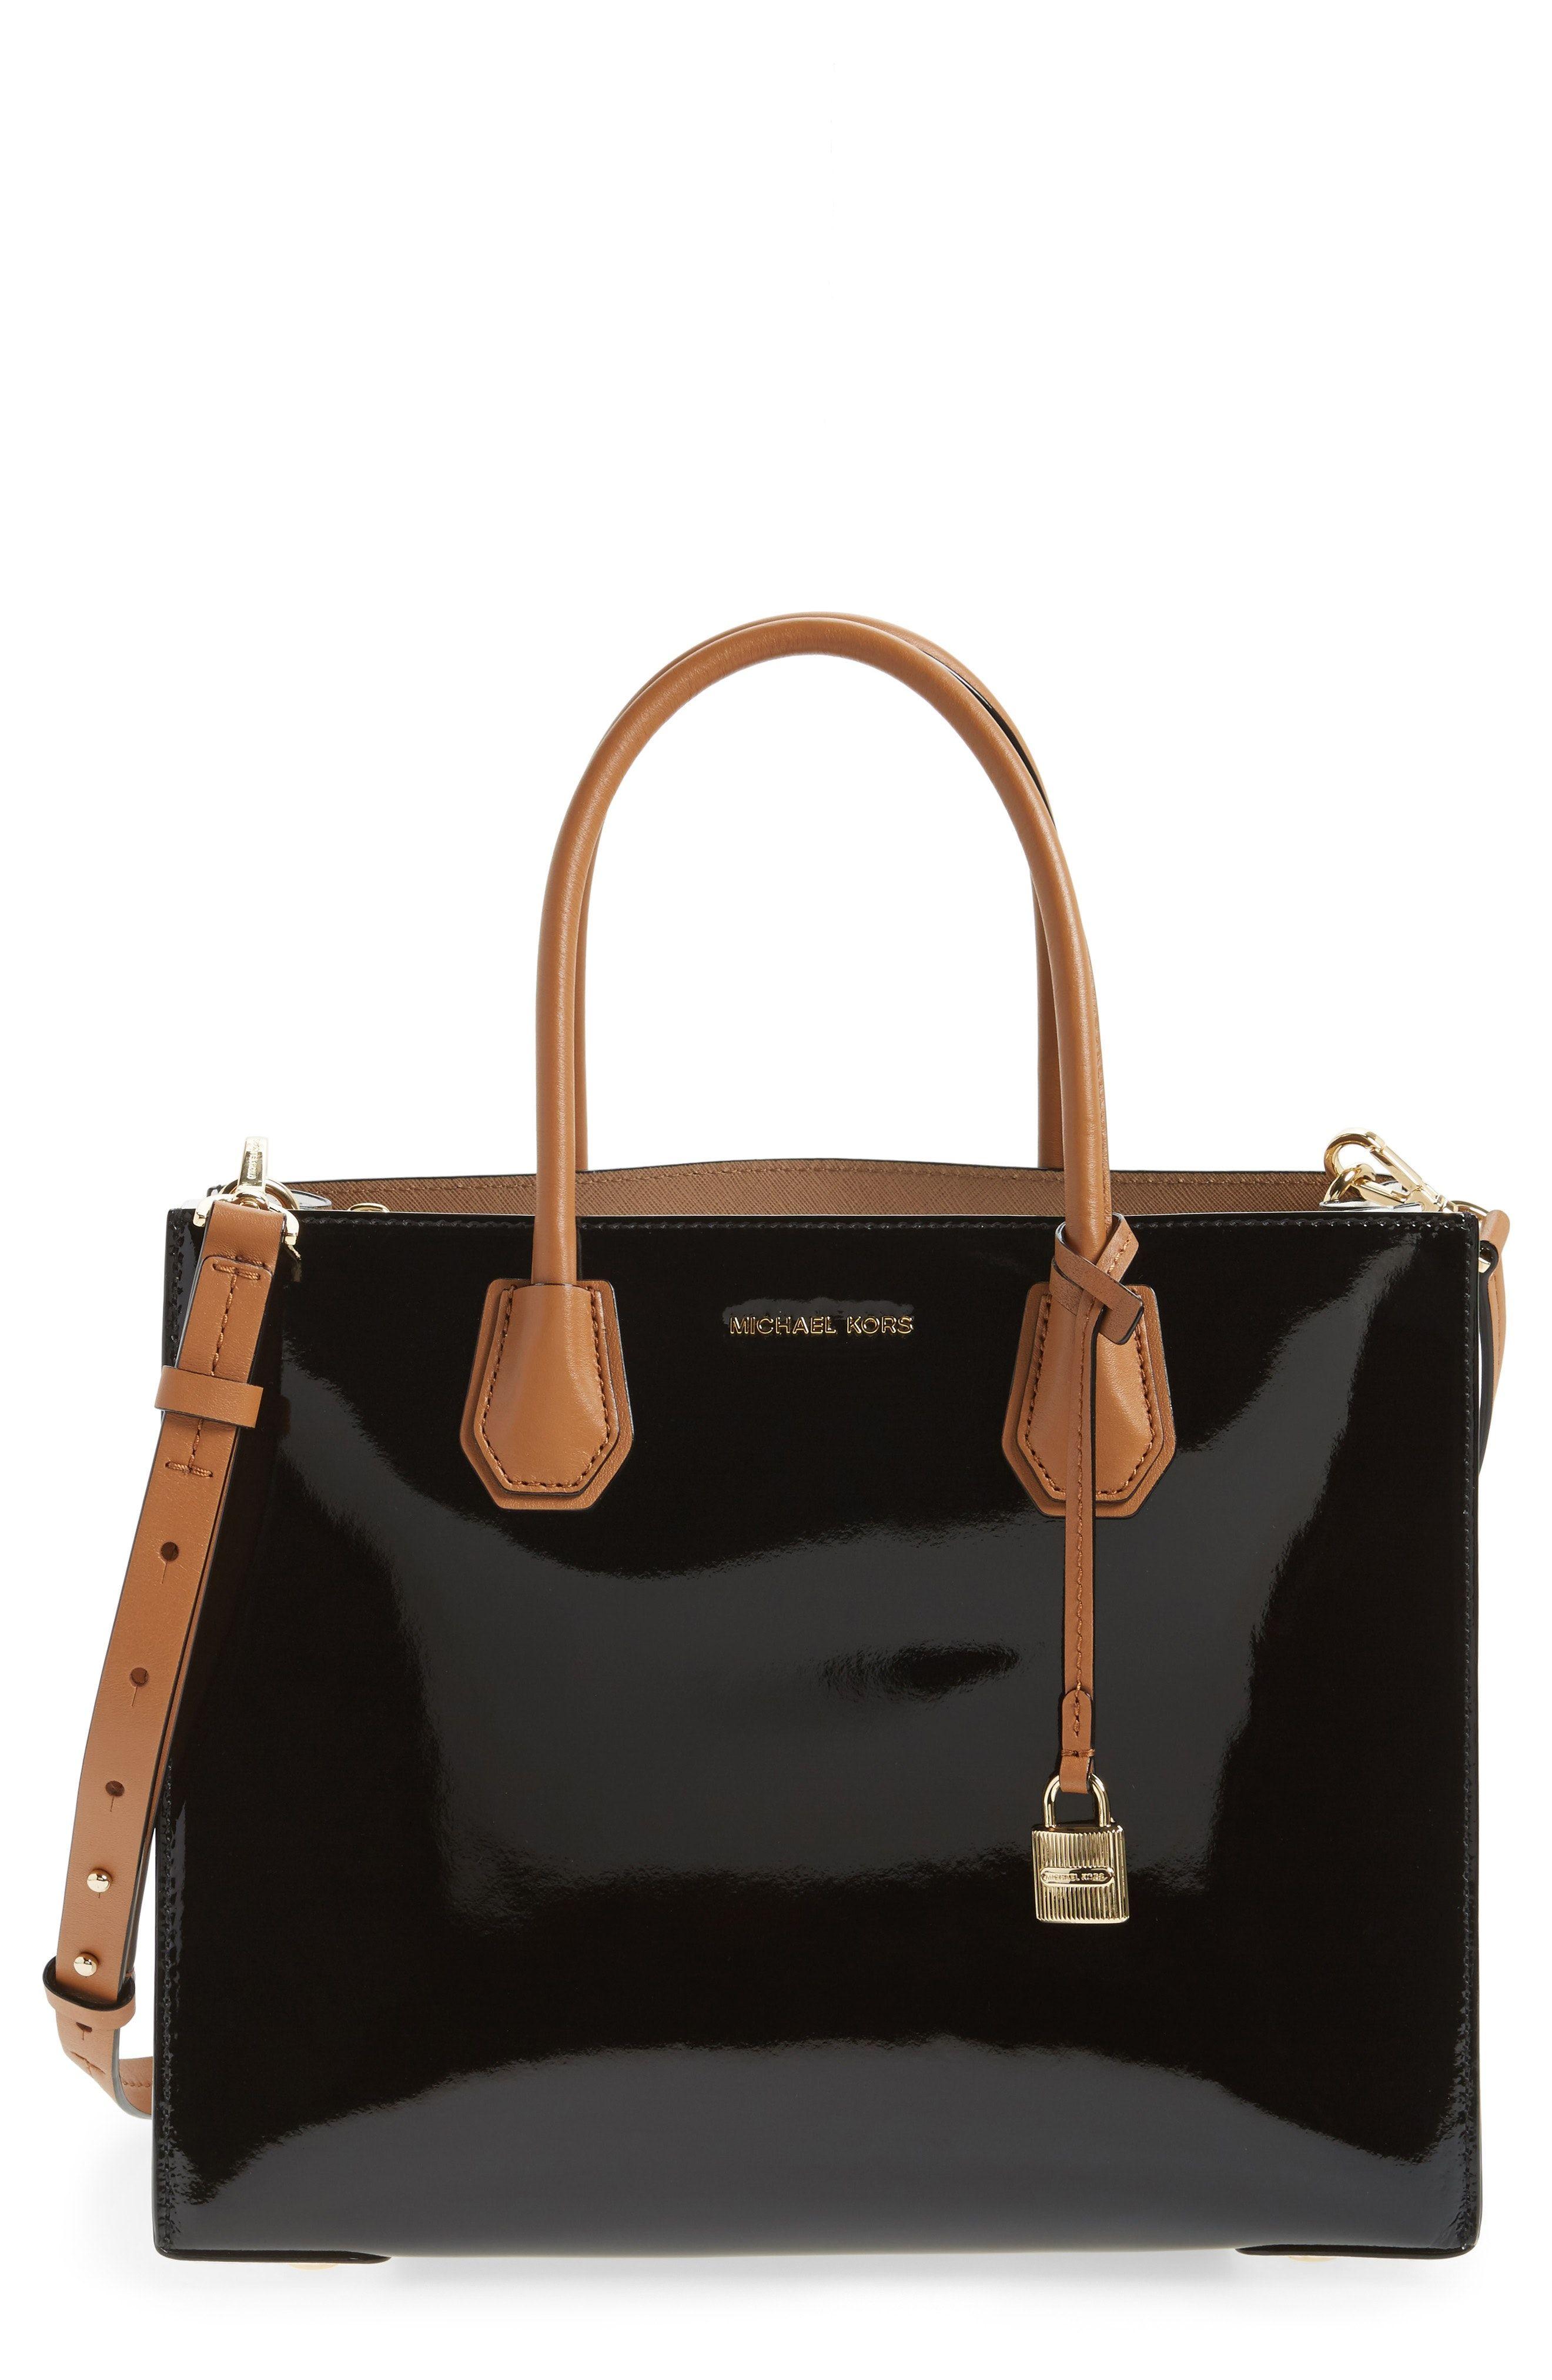 38b3ff13713a New MICHAEL Michael Kors Large Mercer Colorblock Leather Tote fashion  online. [$298]?@shop.seehandbags<<